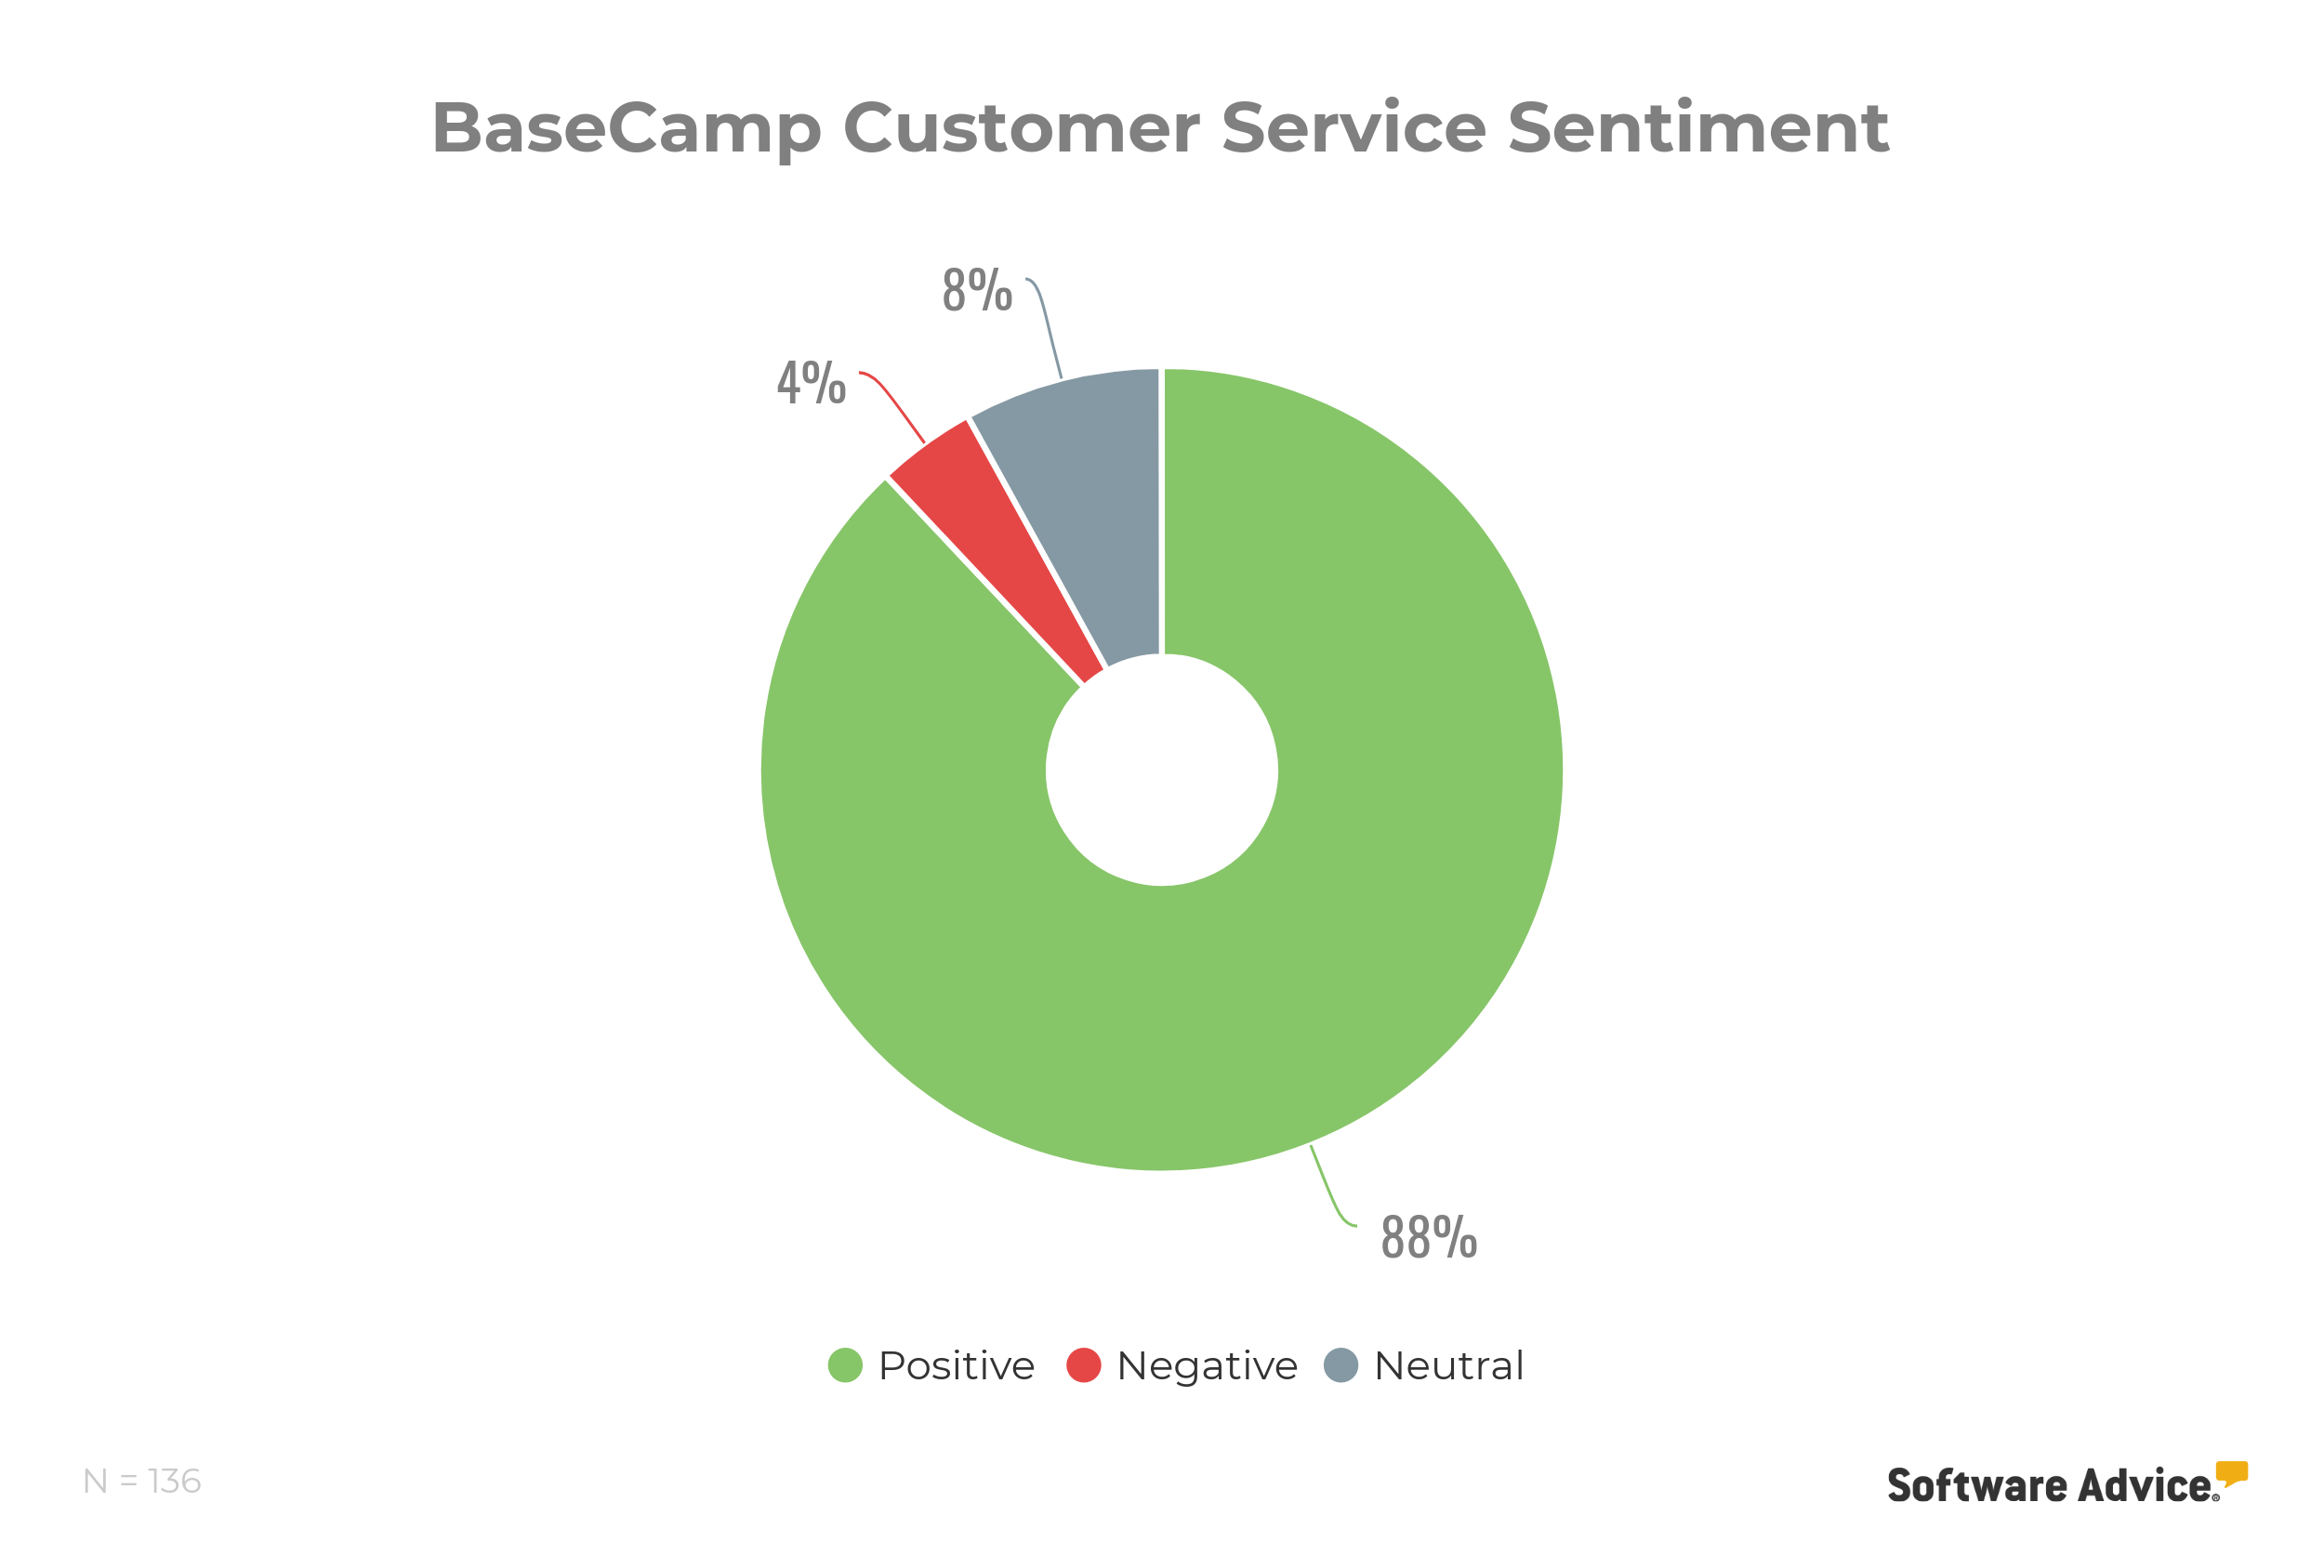 BaseCamp customer service score